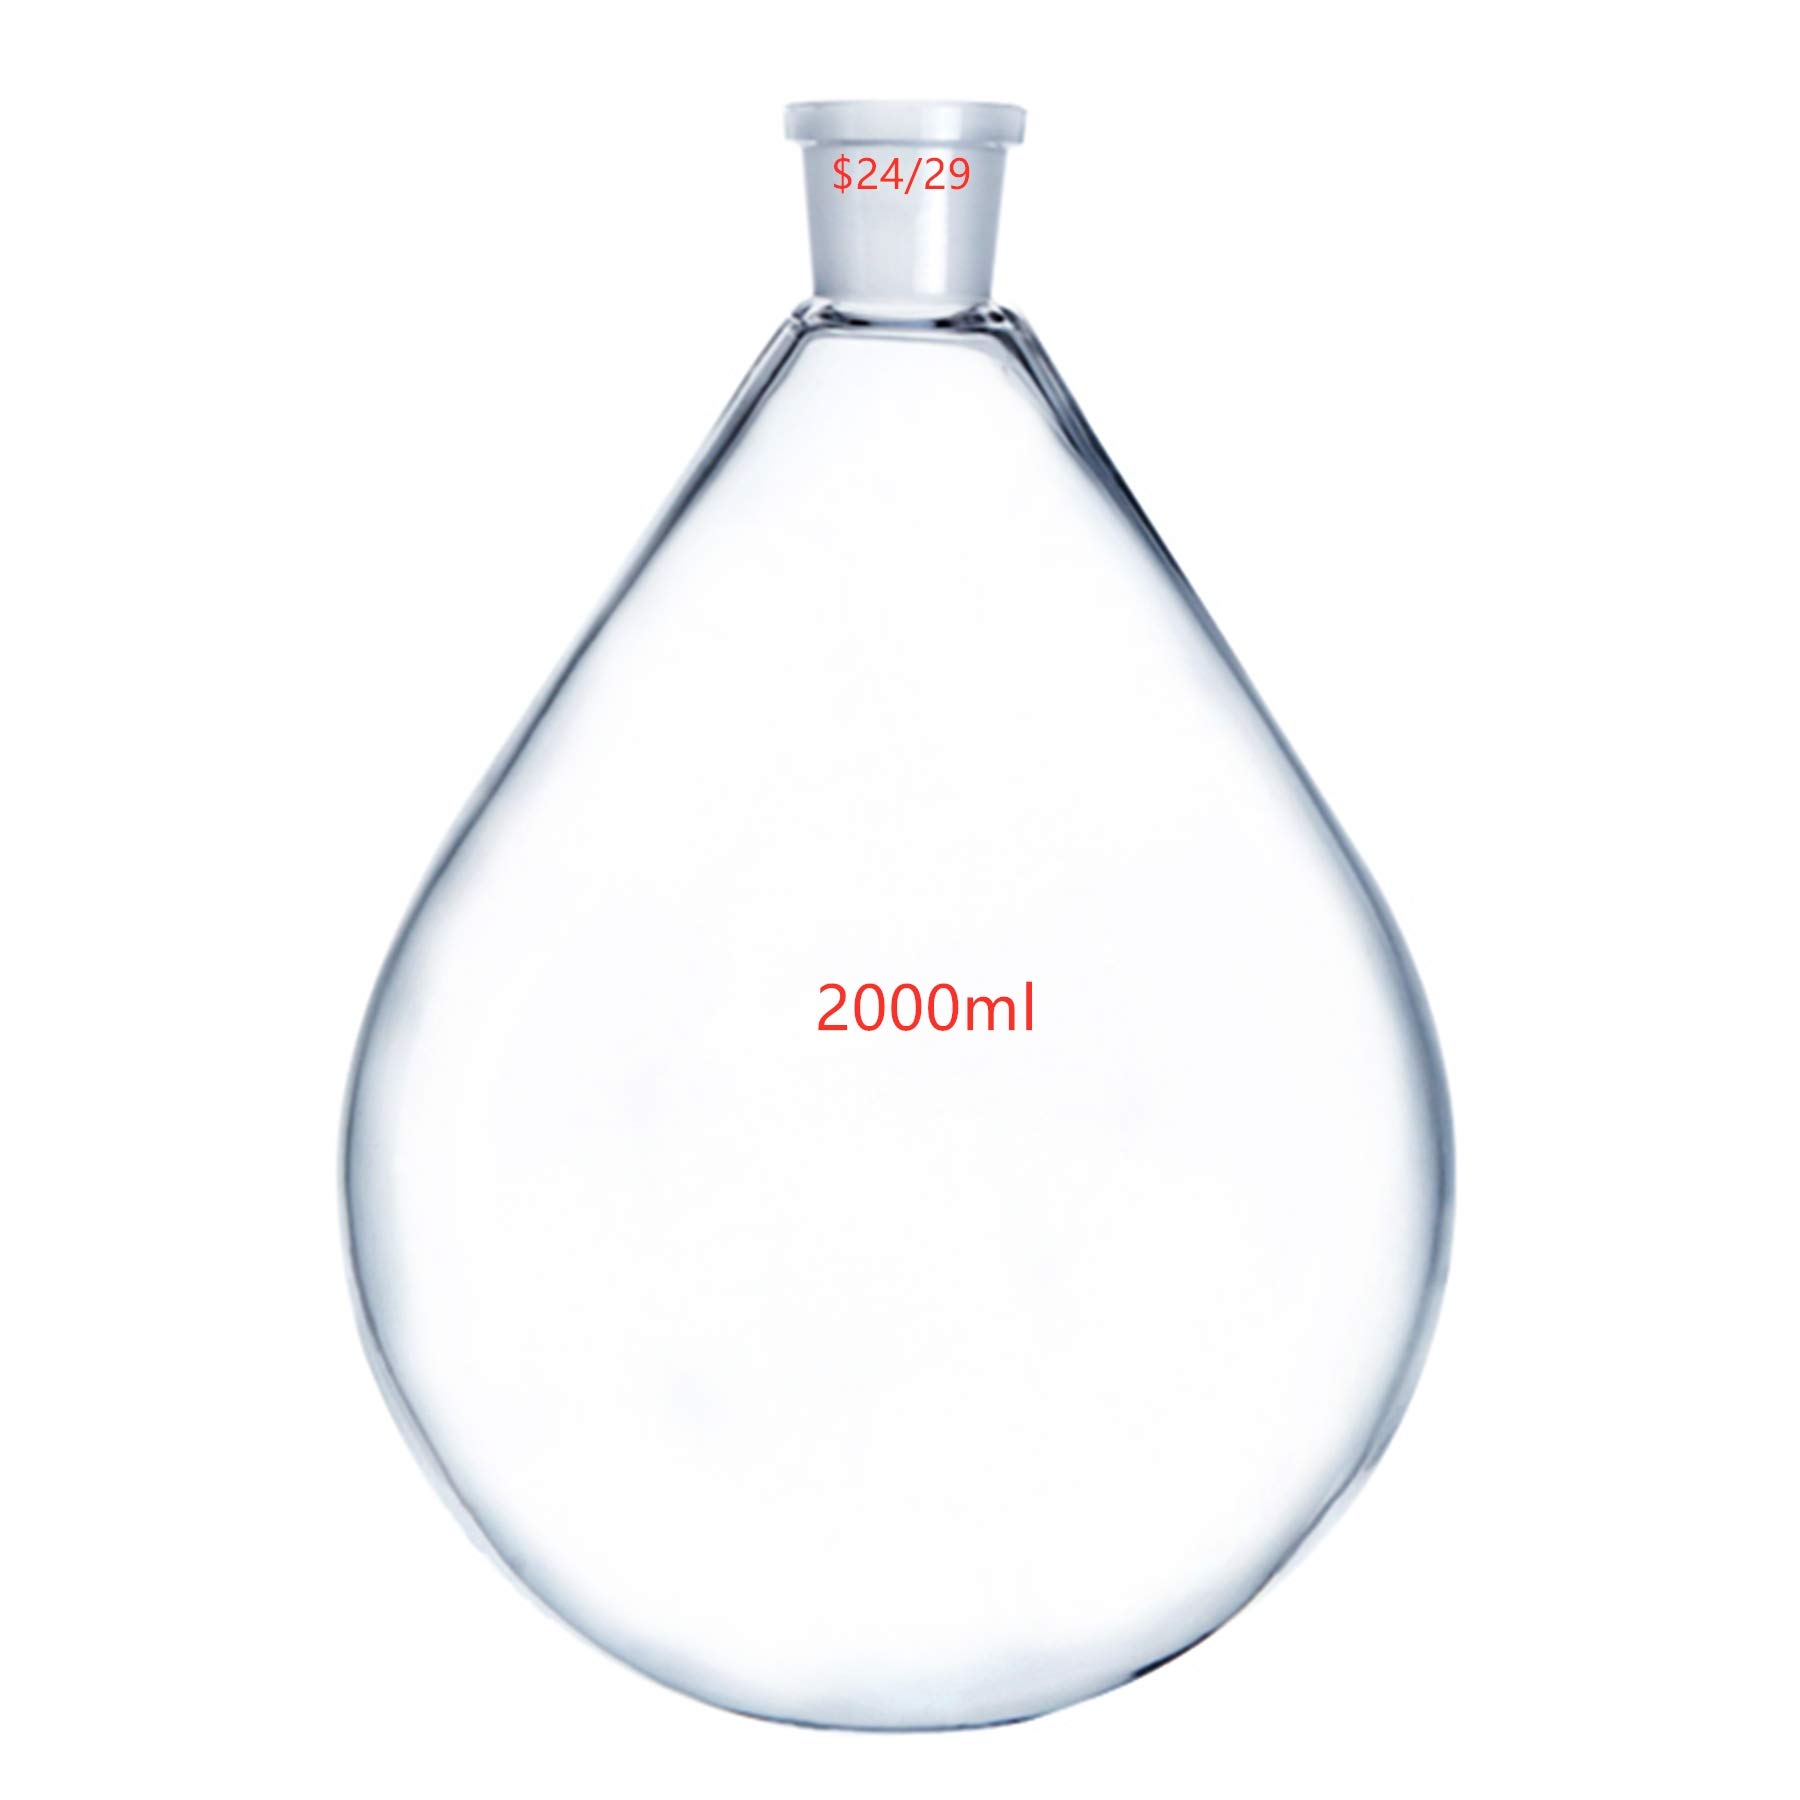 Deschem 2000ml,24/29,Glass Recovery Flask,3 Litre,Rotary Evaporator Vessel Kjelda Bottle by Deschem